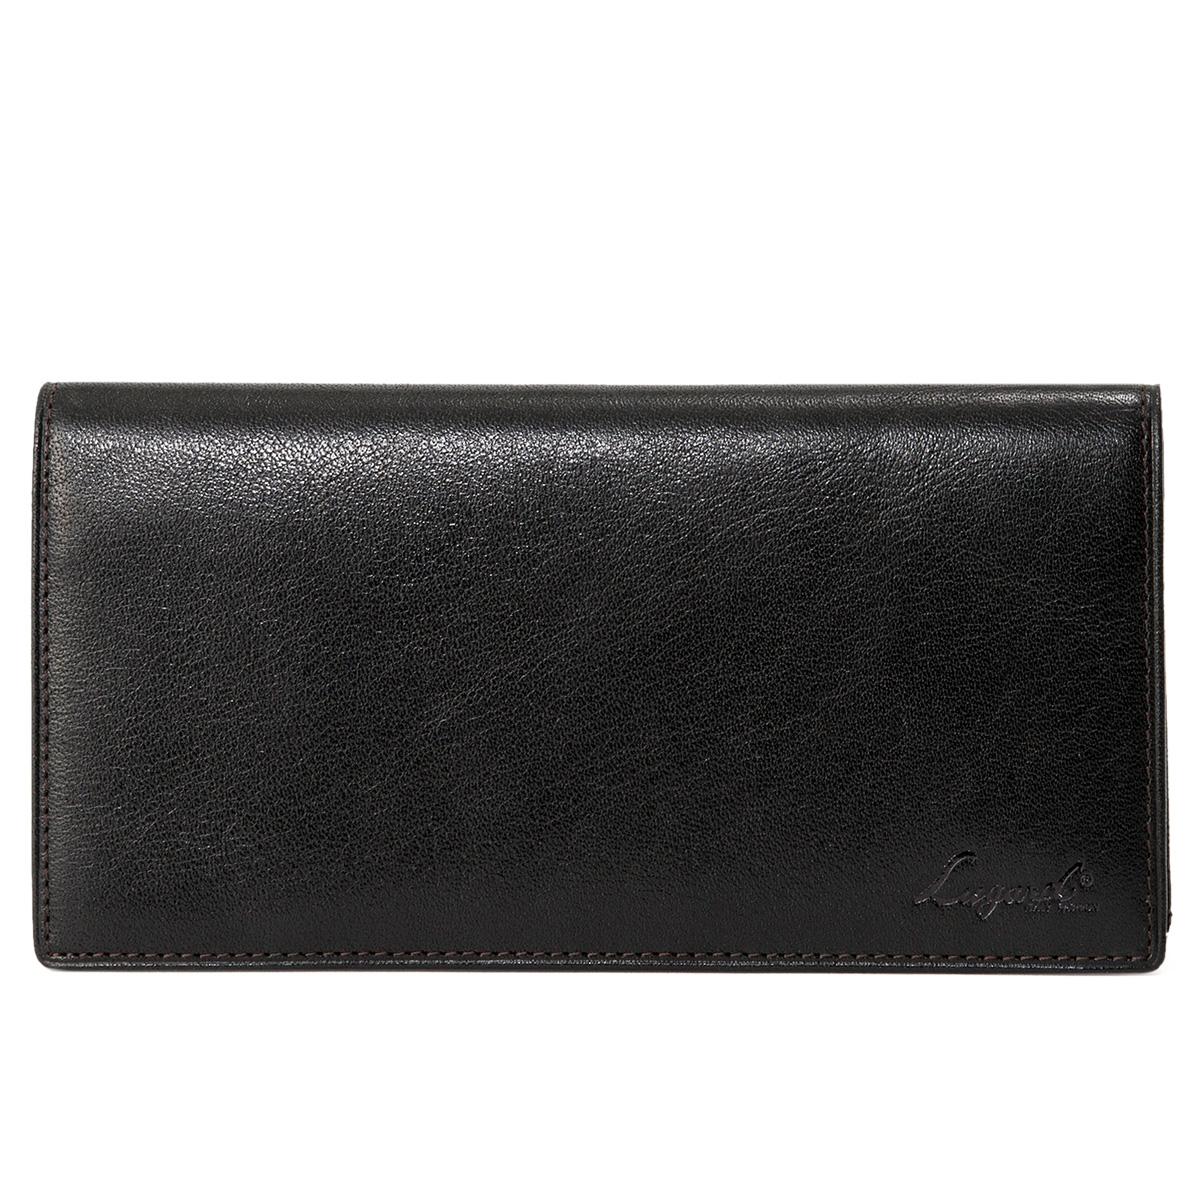 Lugard ラガード 青木鞄 財布 長財布 二つ折り G3 WALLET メンズ ジースリー ブラック ネイビー ブラウン 黒 5206 [2/12 新入荷]